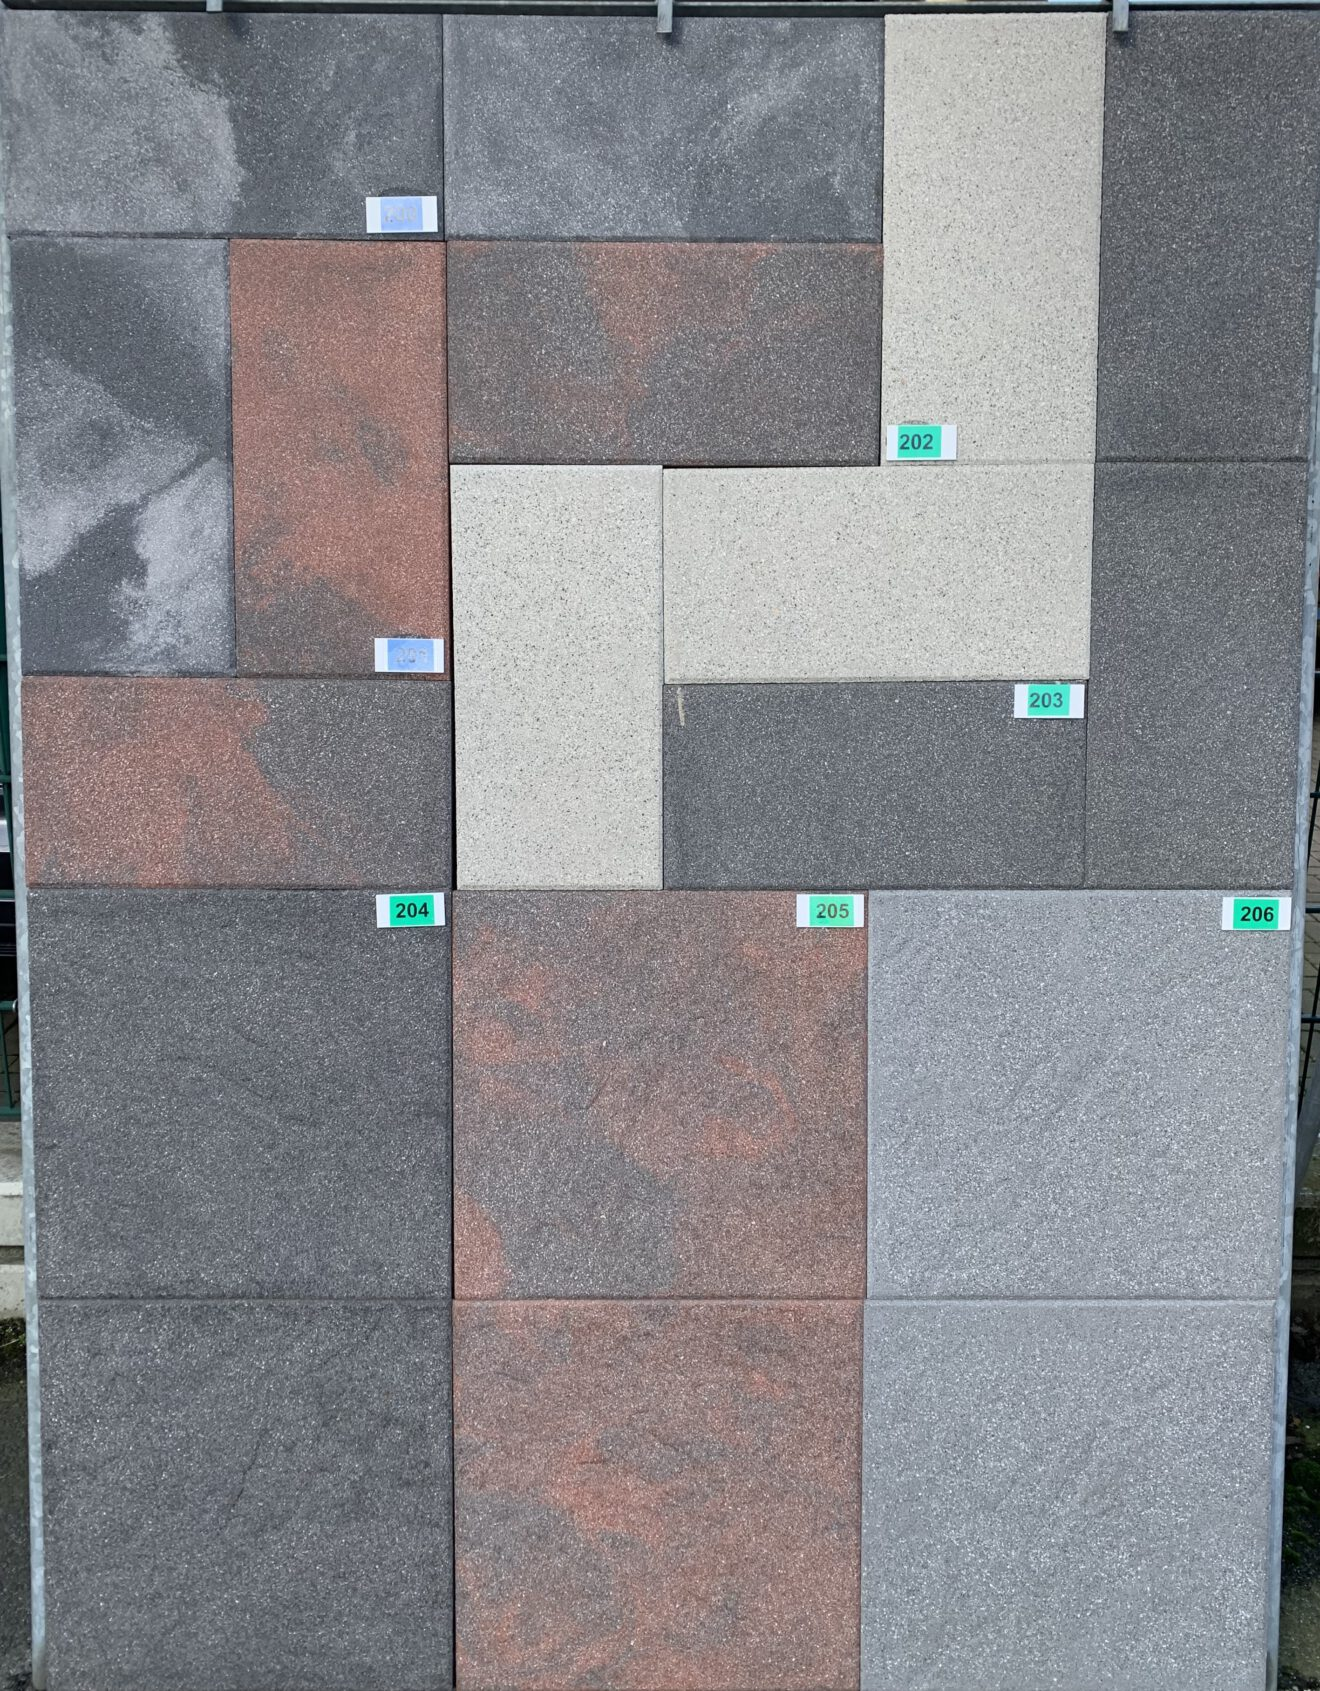 Terrassenplatten Novagranit grau bei Stolzenbach Baustoffe in Bremen kaufen